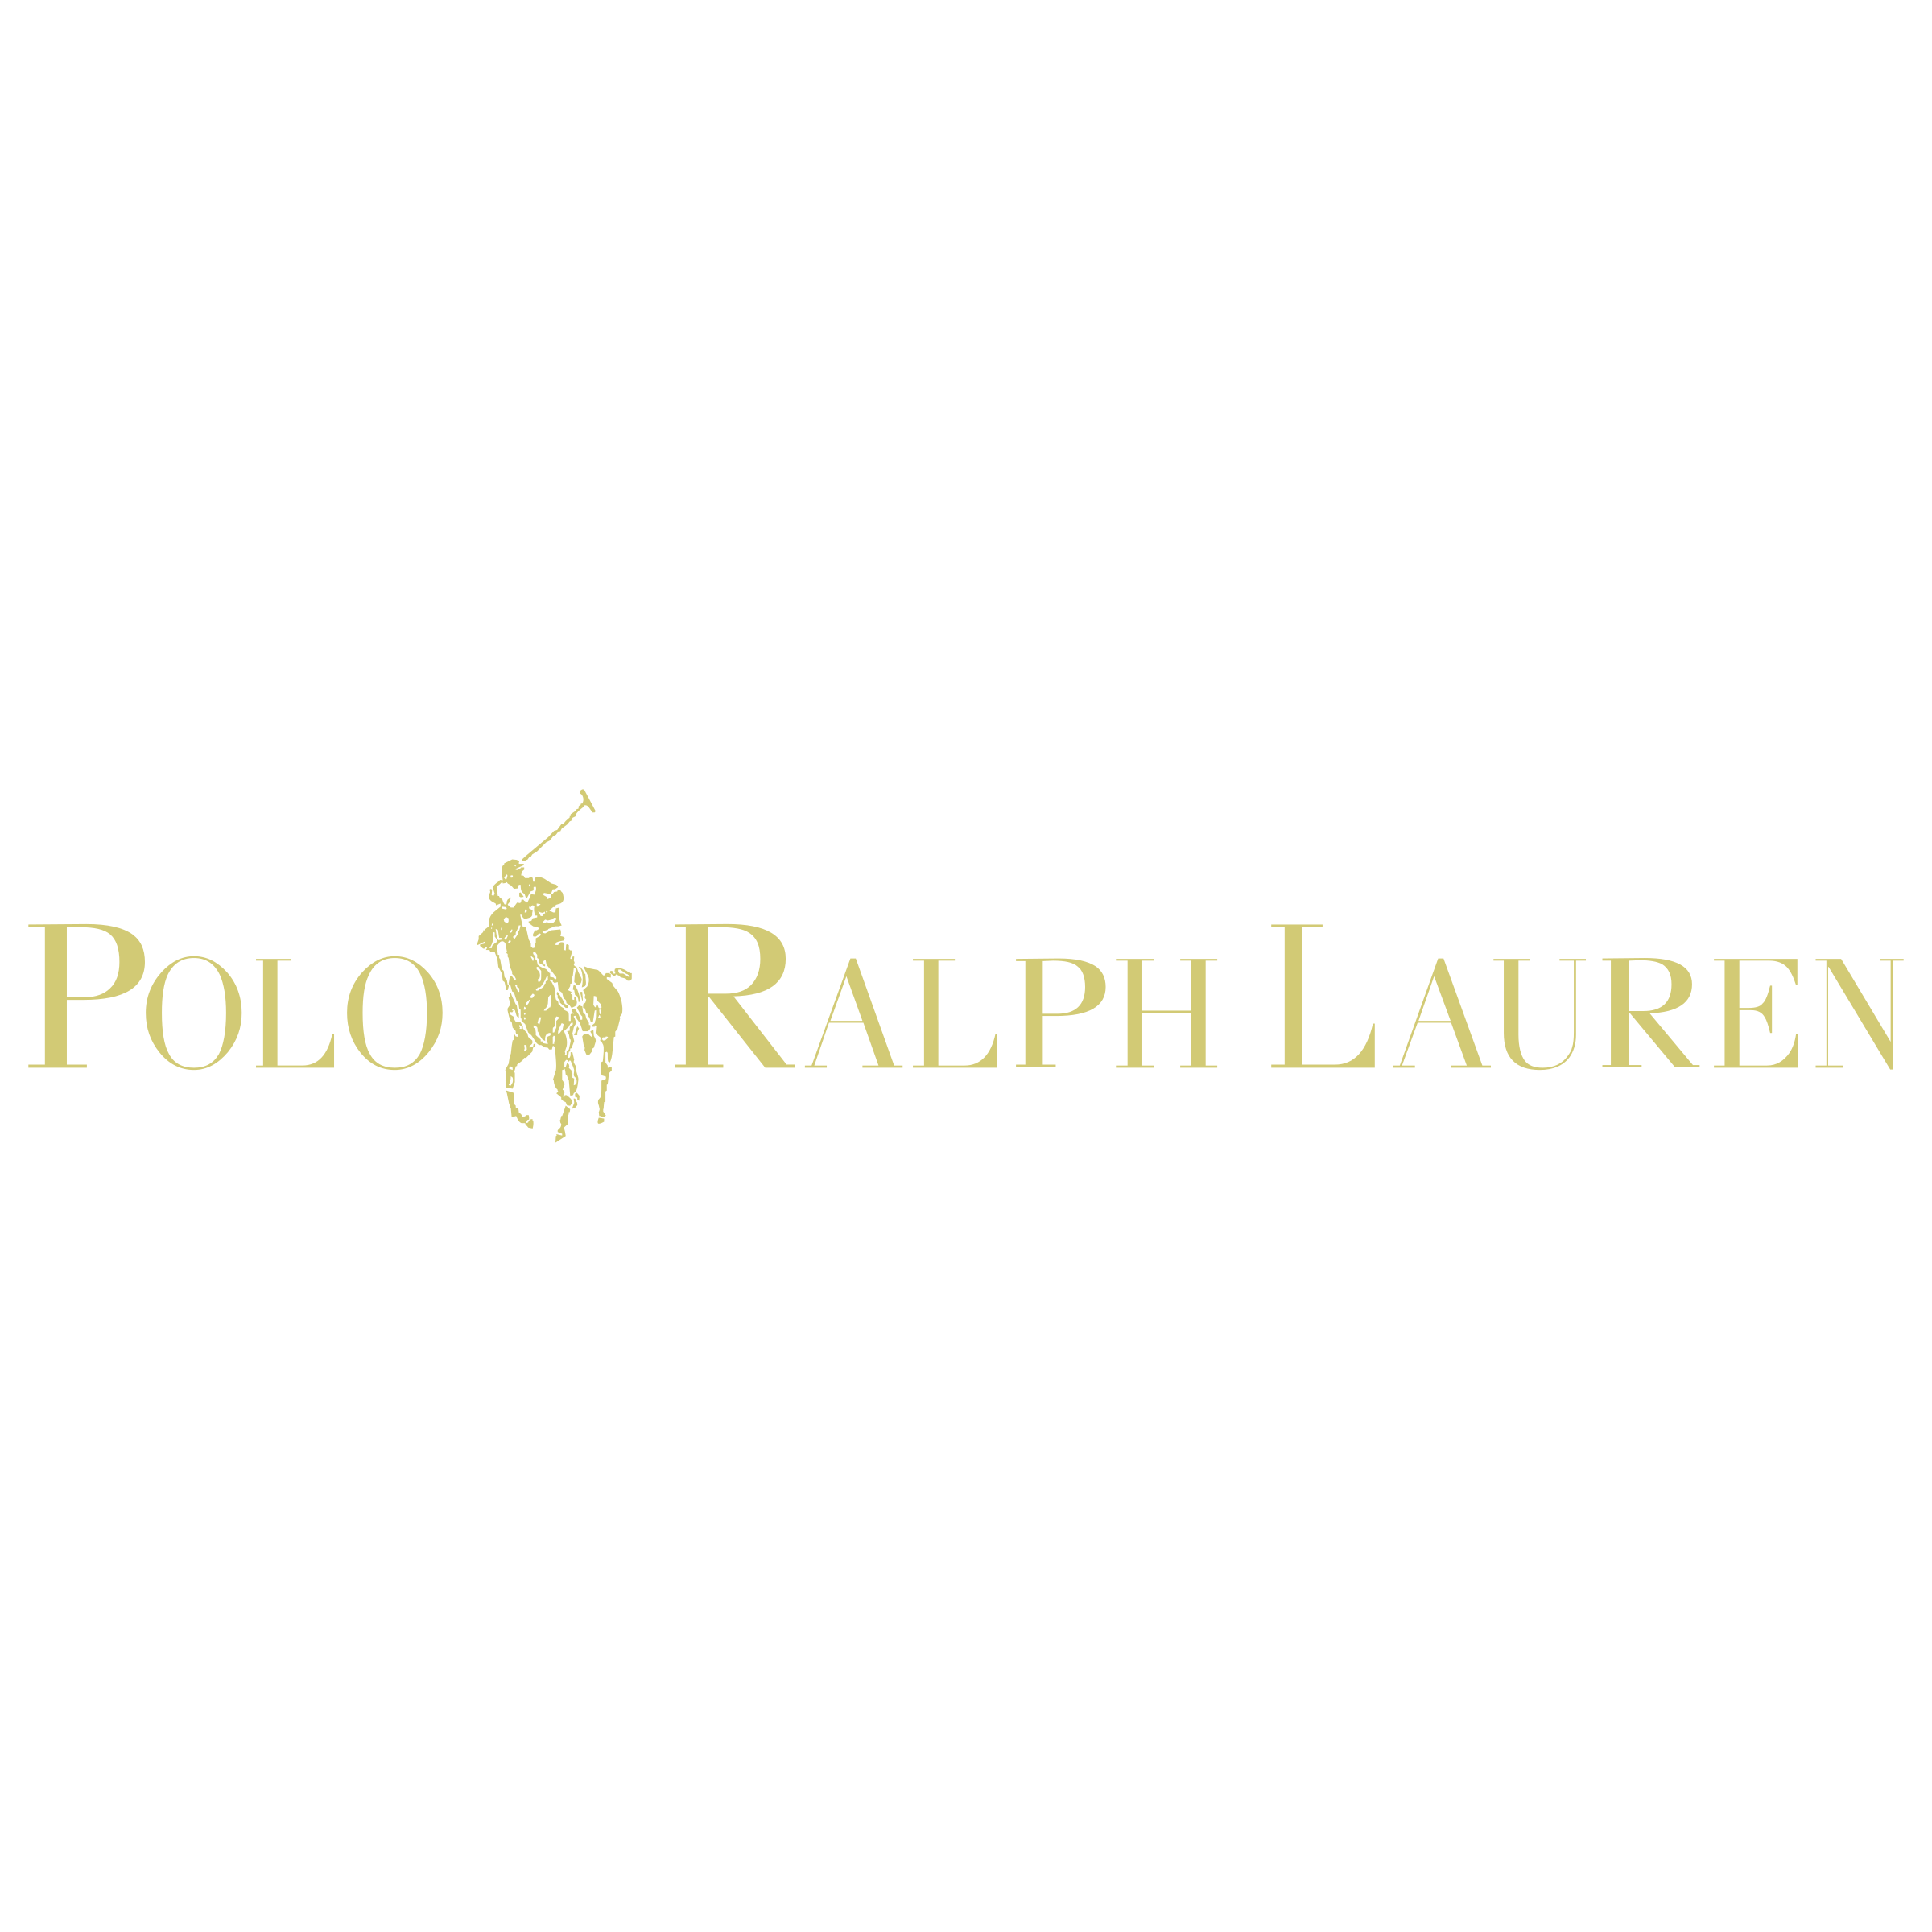 383a296f6 Polo Ralph Lauren Logo PNG Transparent   SVG Vector - Freebie Supply